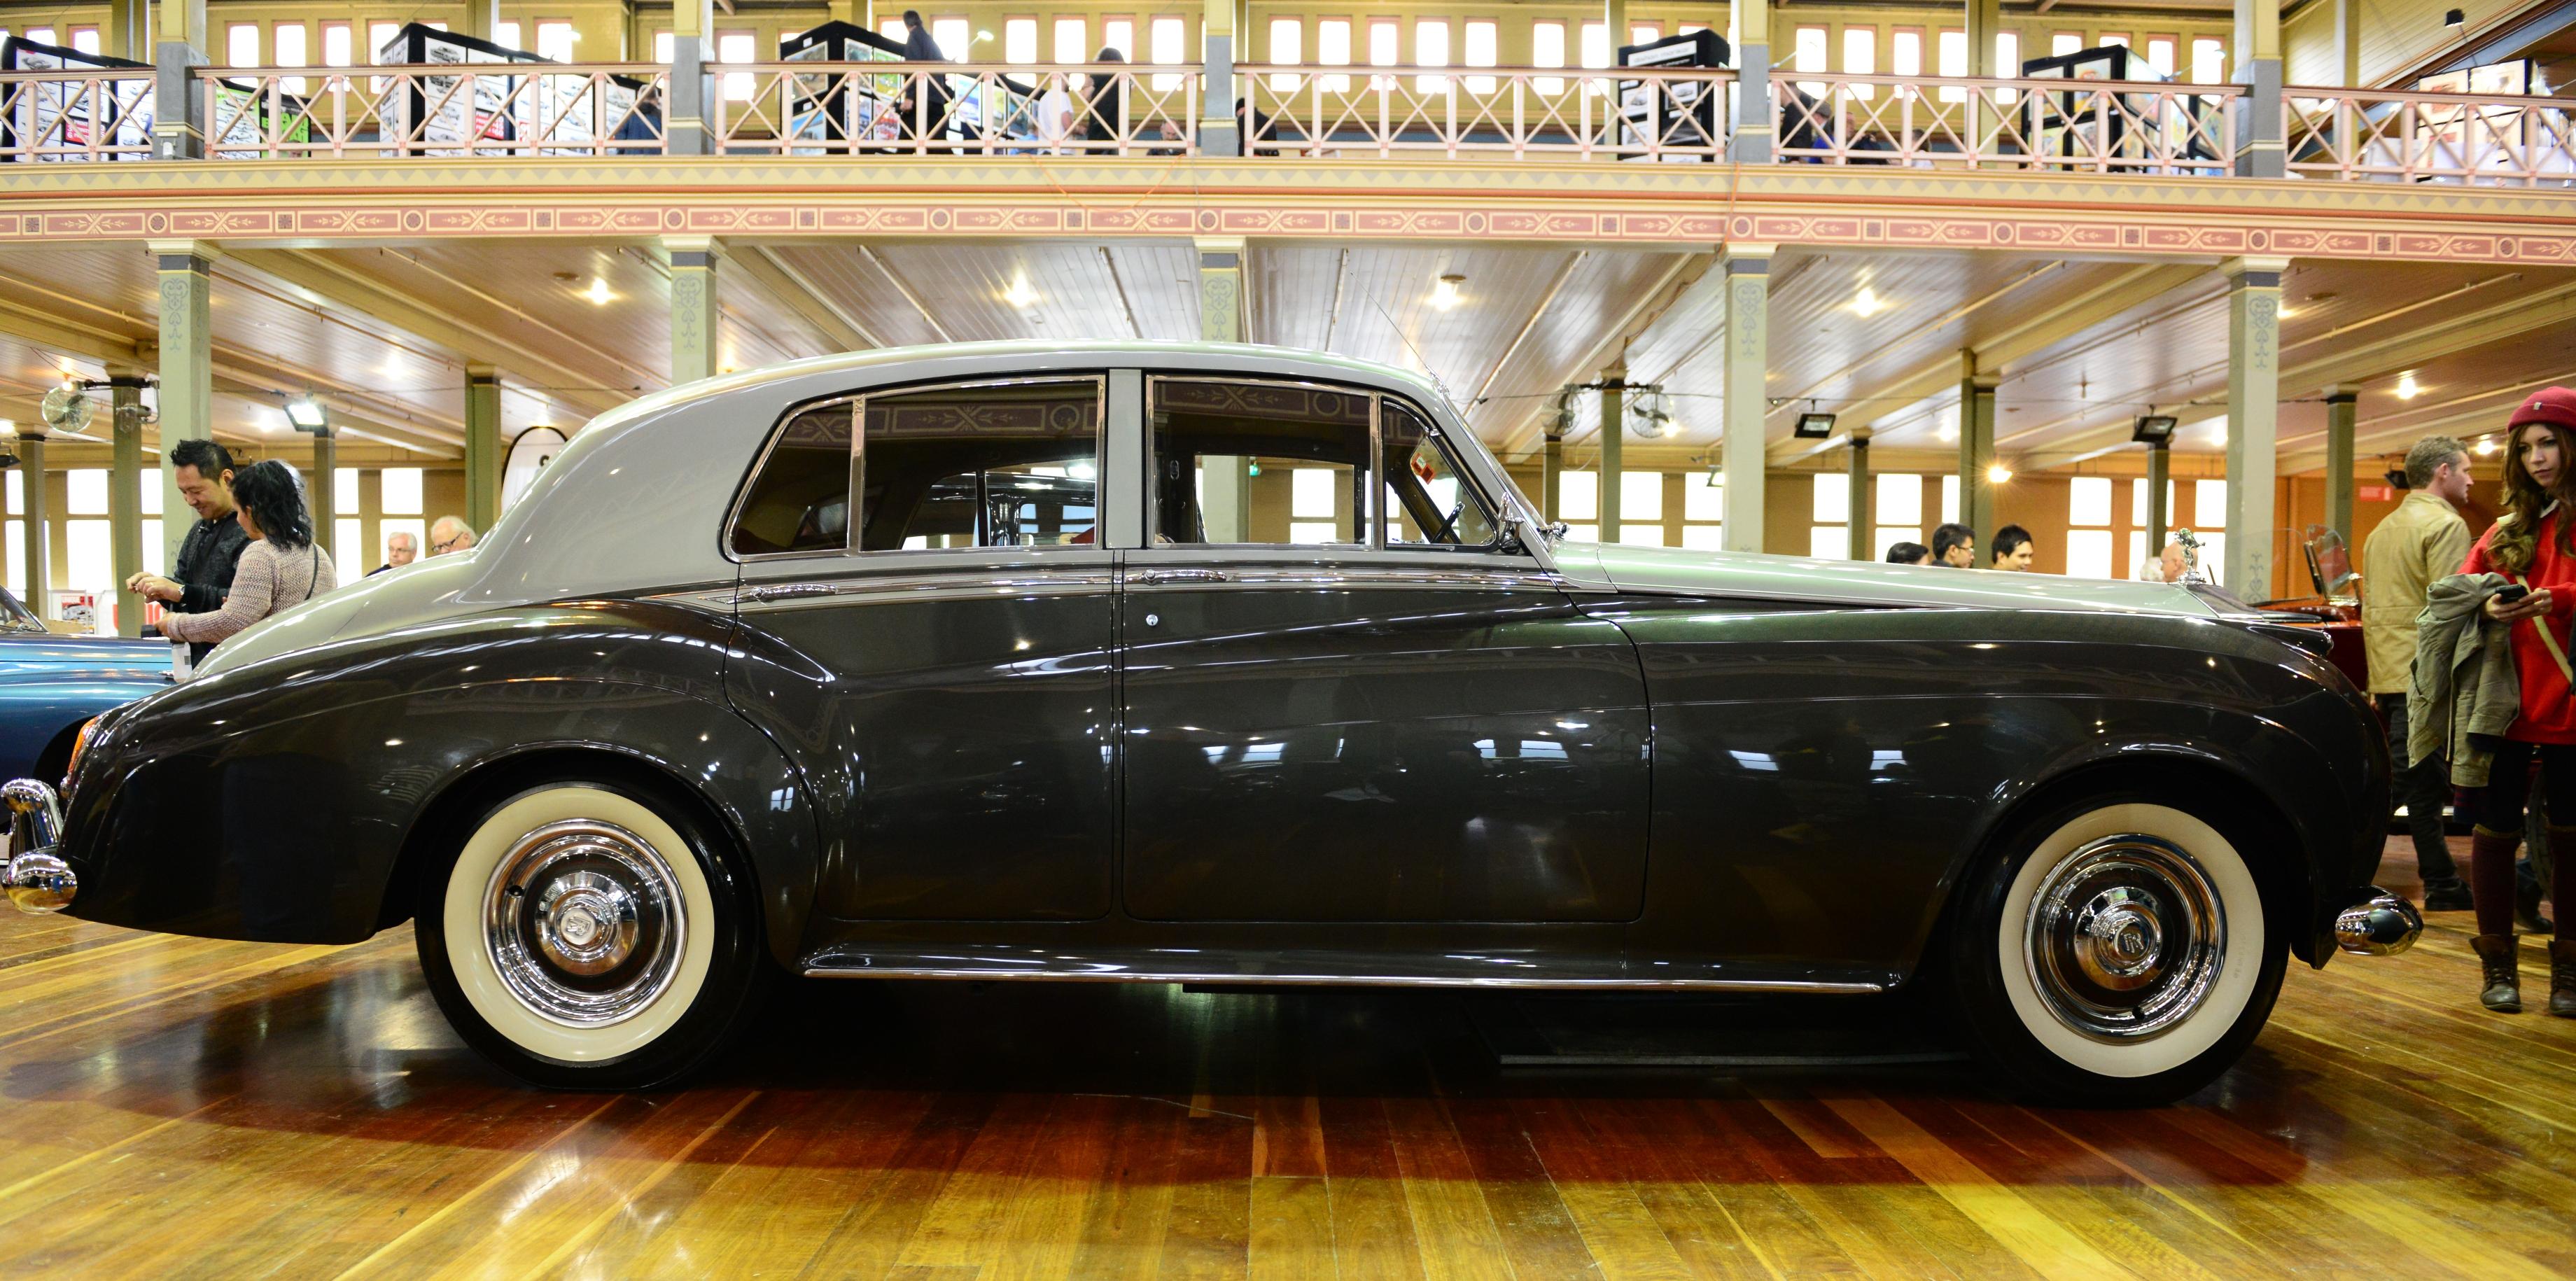 File:1961 Rolls-Royce Silver Cloud II (2013 RACV MotorClassica) (10492690735